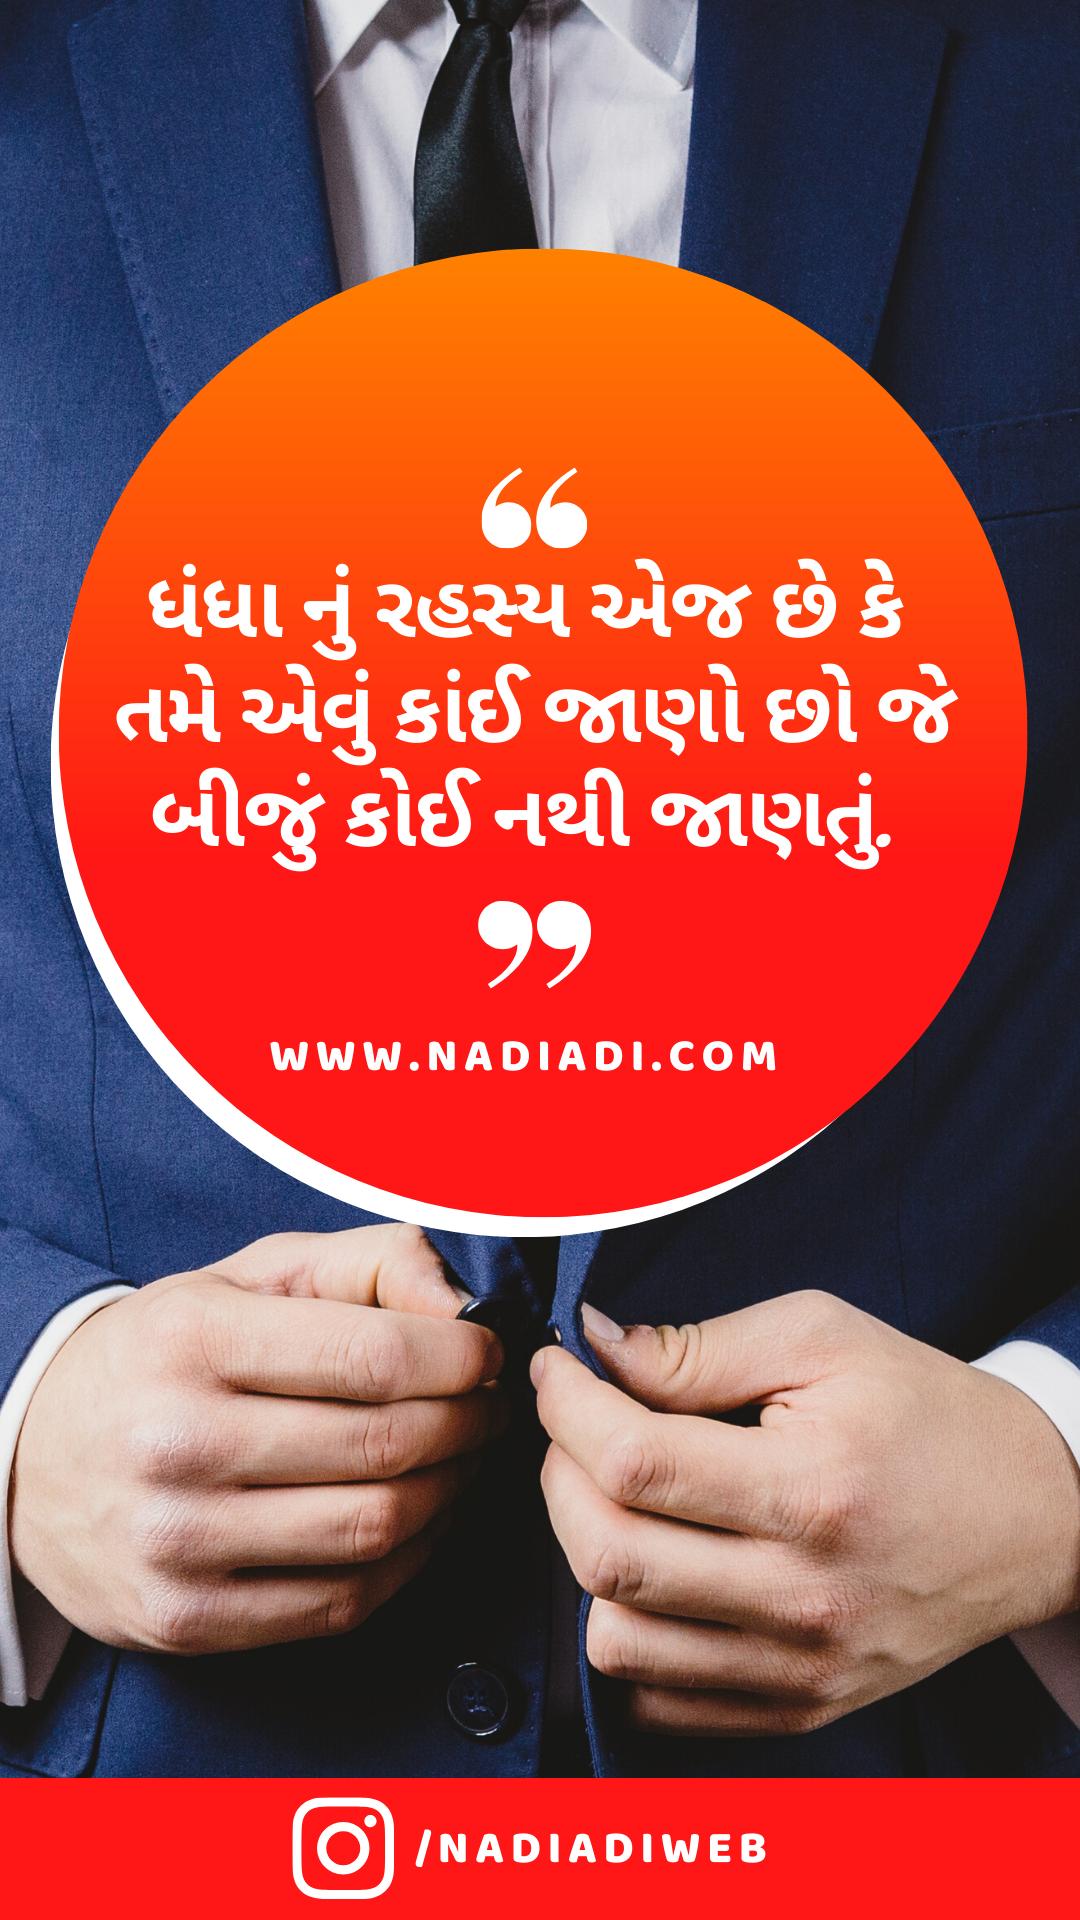 Dhandho Gujarati Business Secret Quote Motivational Secret Quotes Business Quotes Image Quotes [ 1920 x 1080 Pixel ]